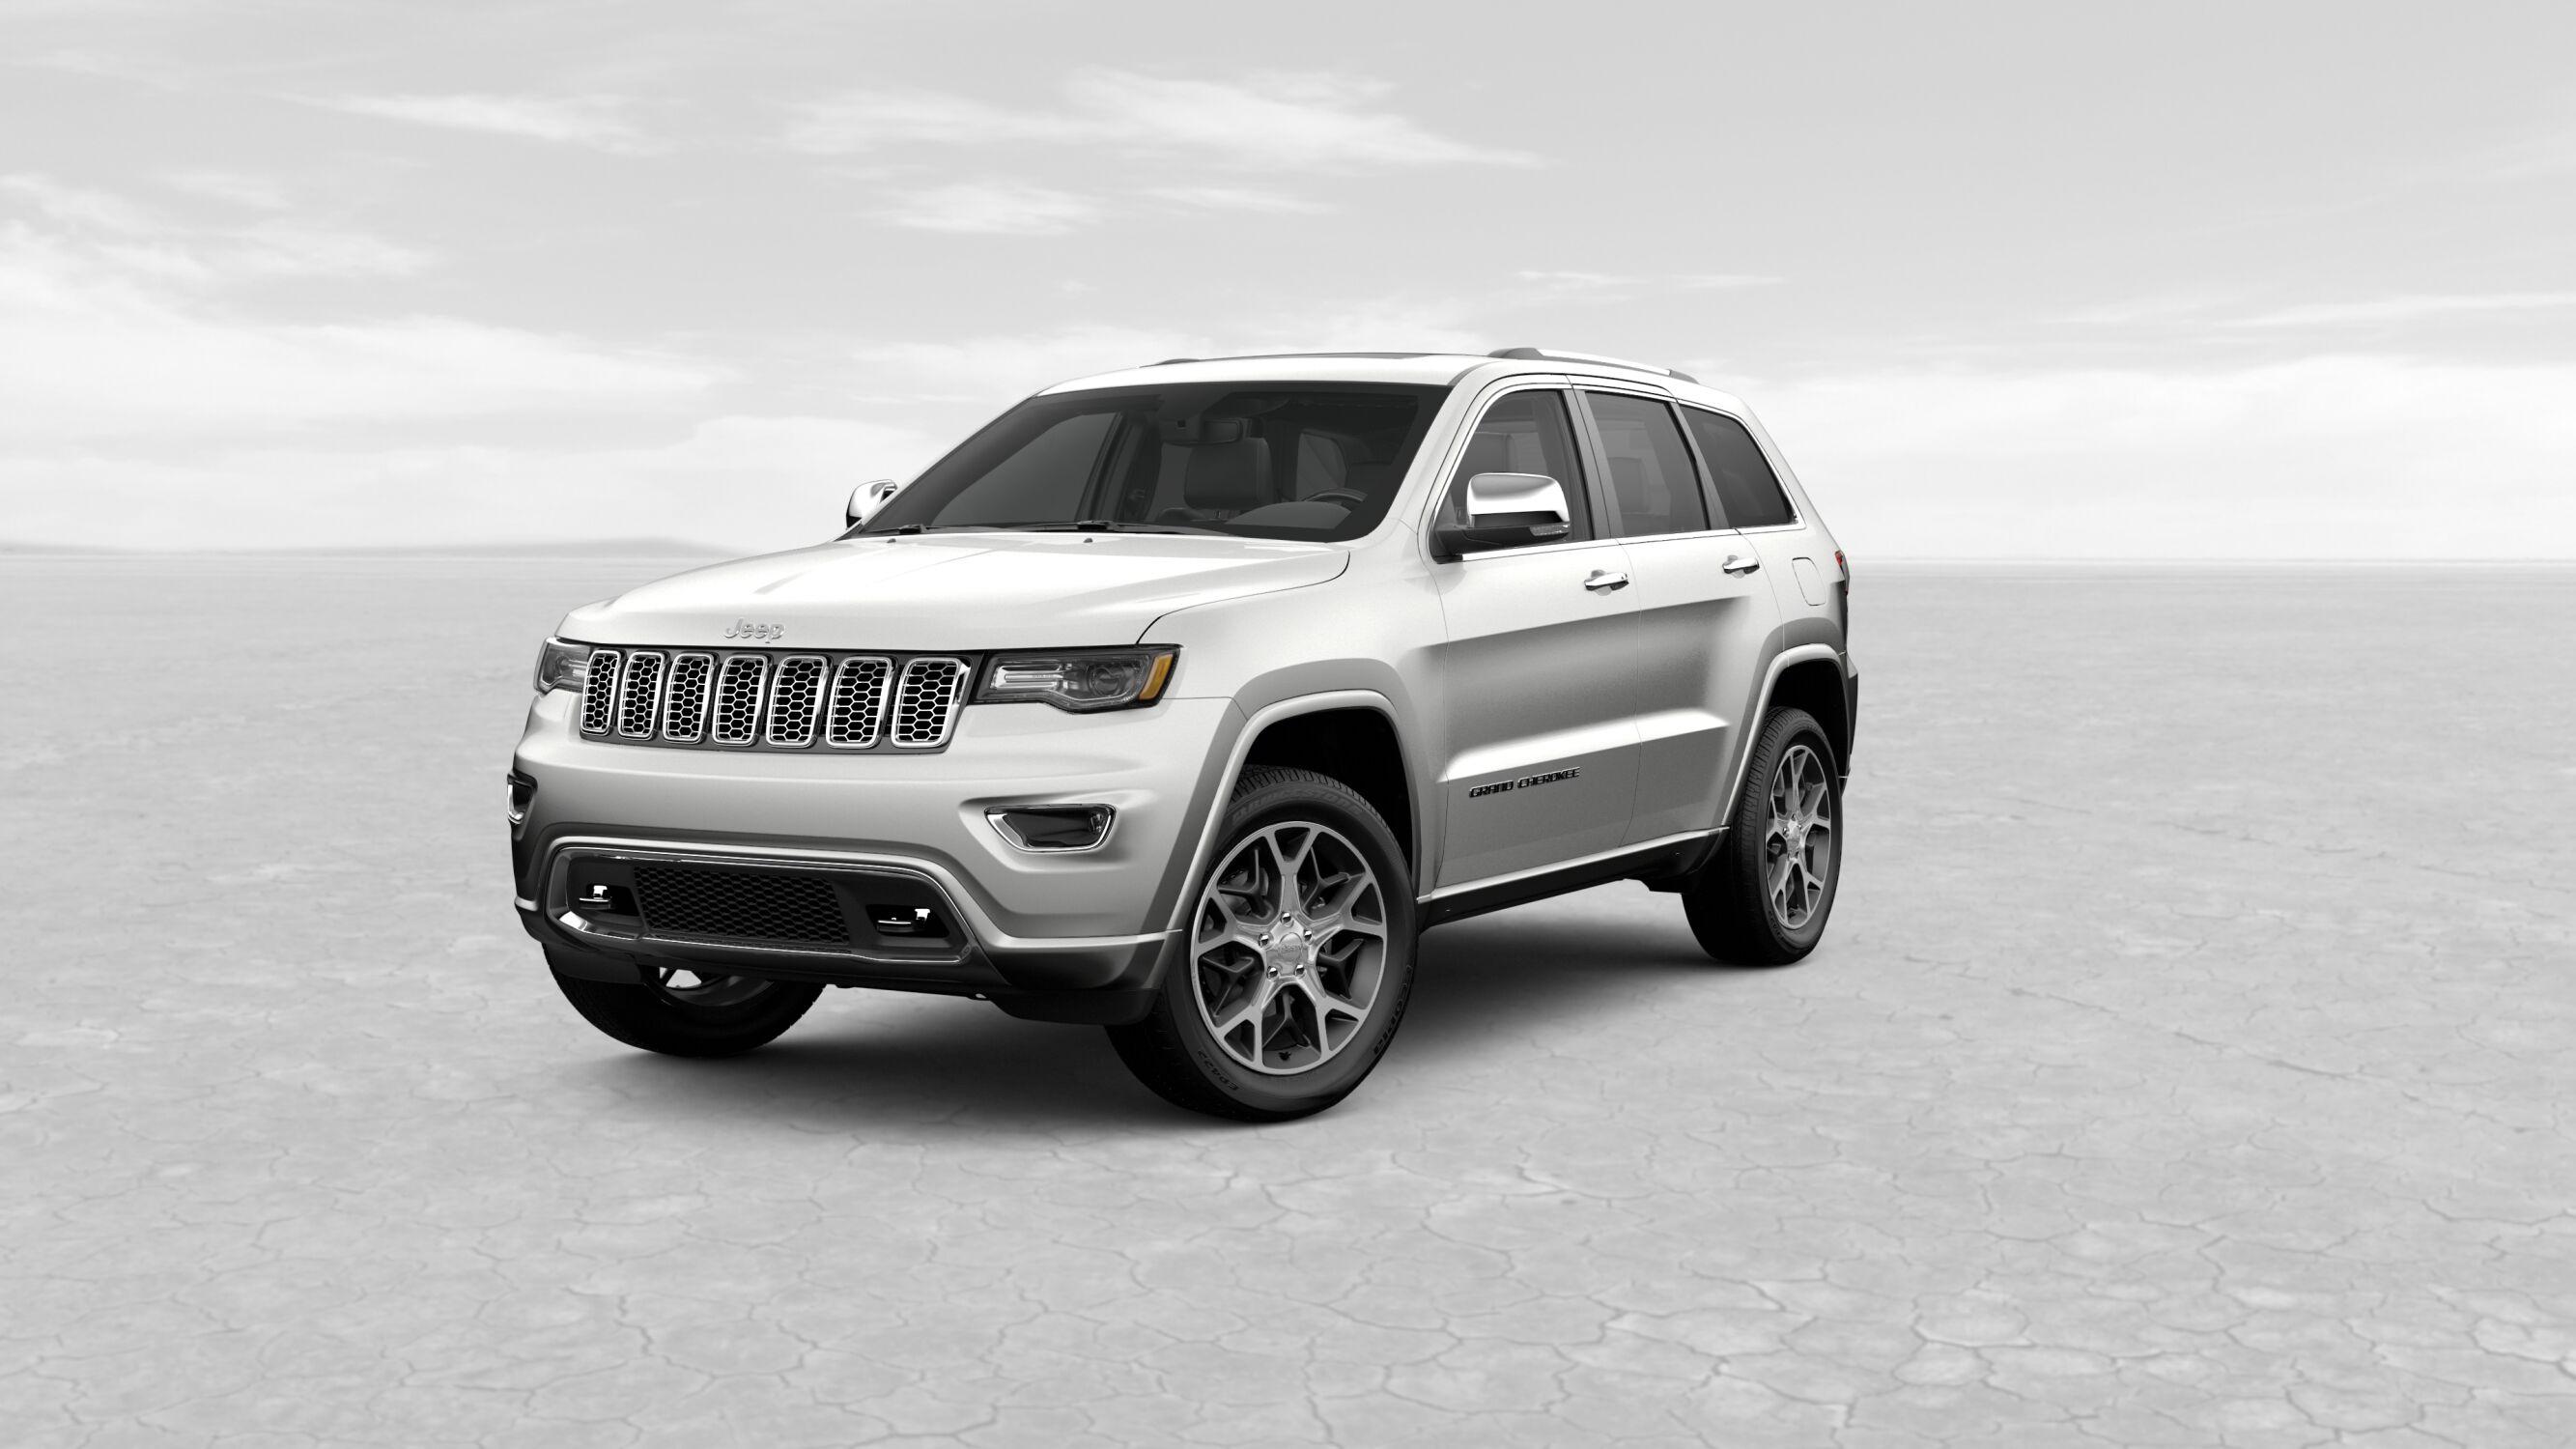 2019 Jeep Grand Cherokee Overland Acton Chrysler Dodge Jeep Ram Acton Ma